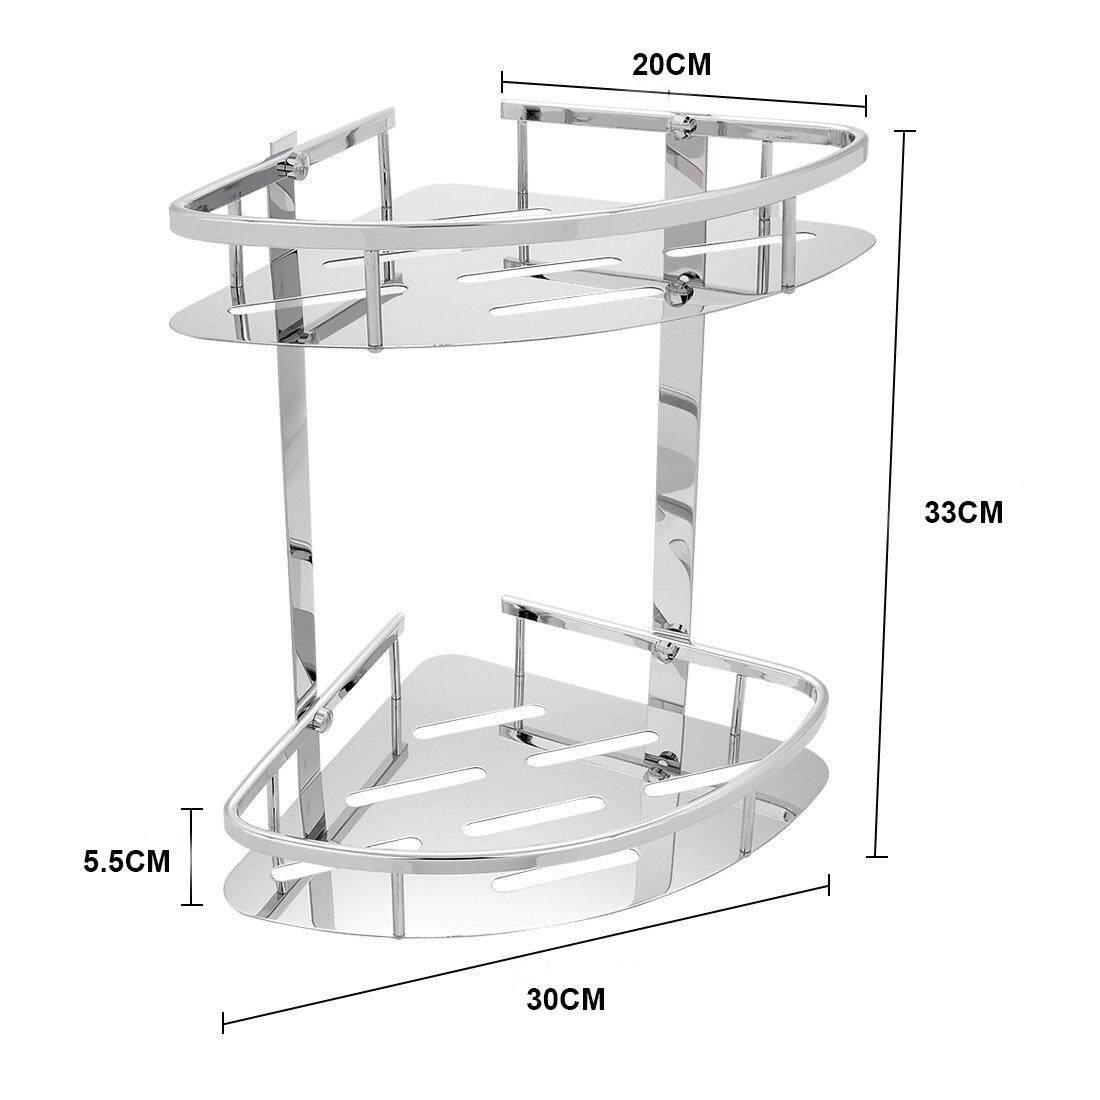 SUS304 Stainless Steel 2 tiers Storage Shelves Triangle BasketShower ...